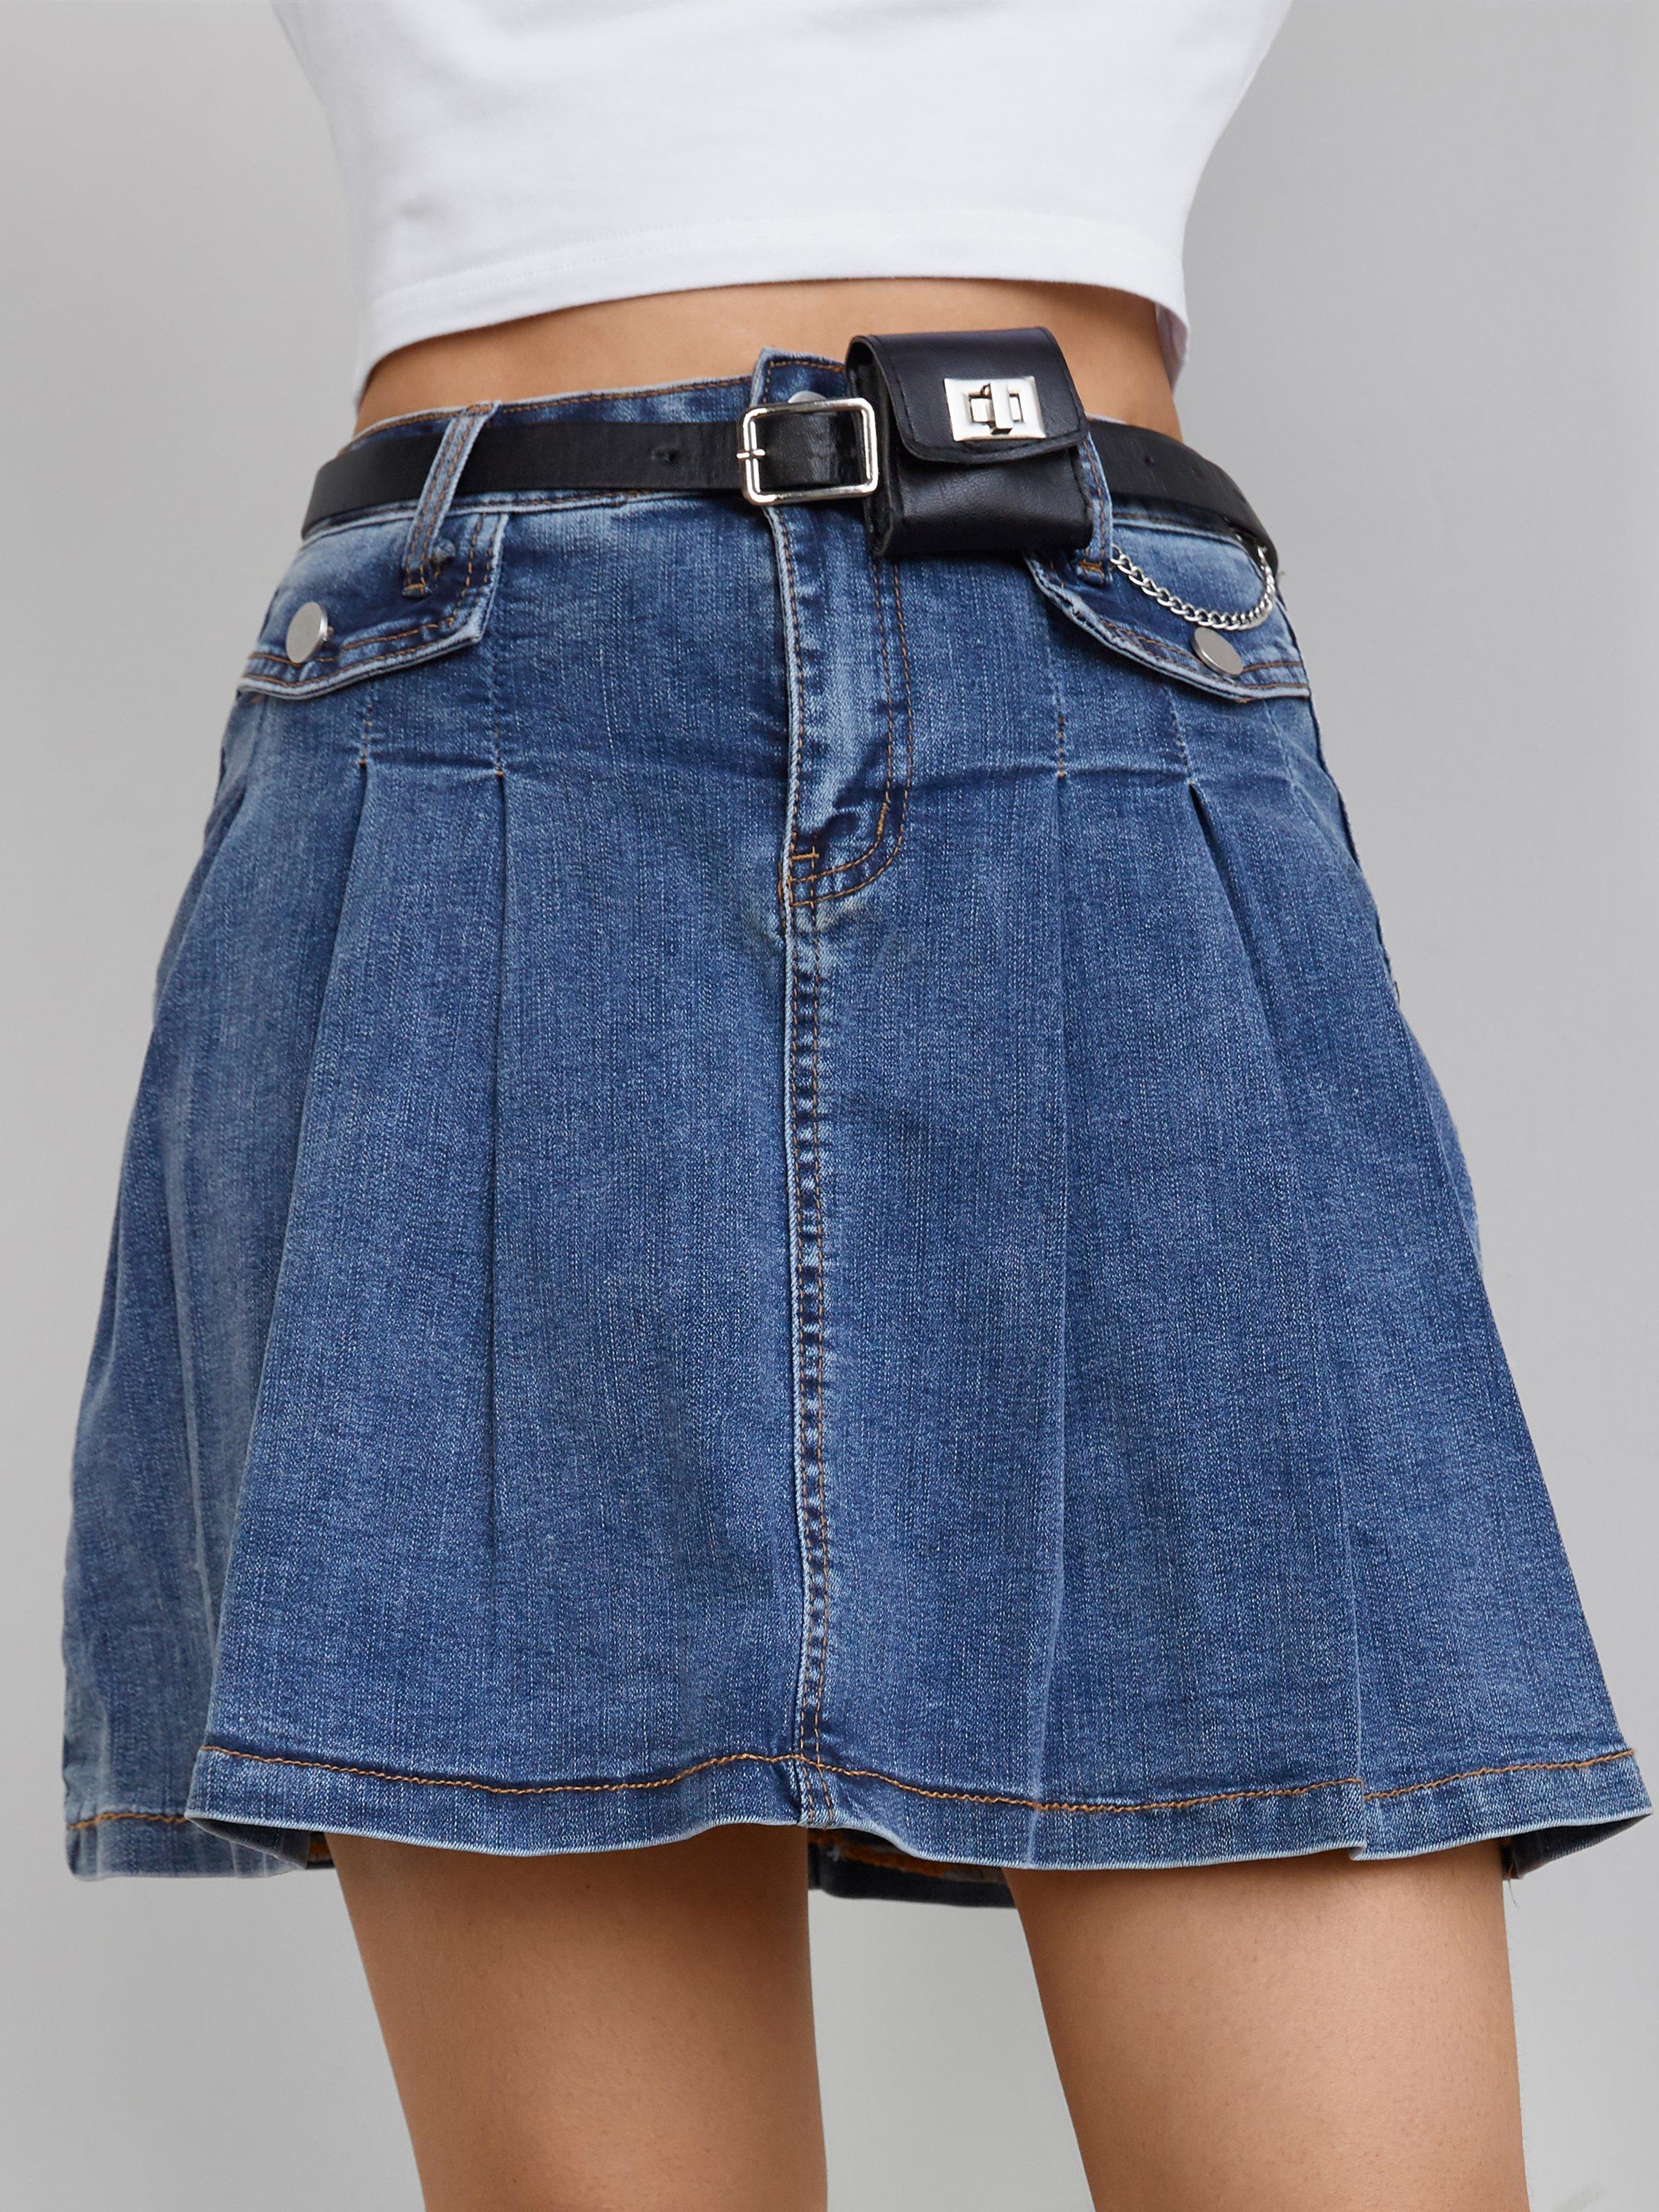 Pleated Denim Mini Skirt - Blue S